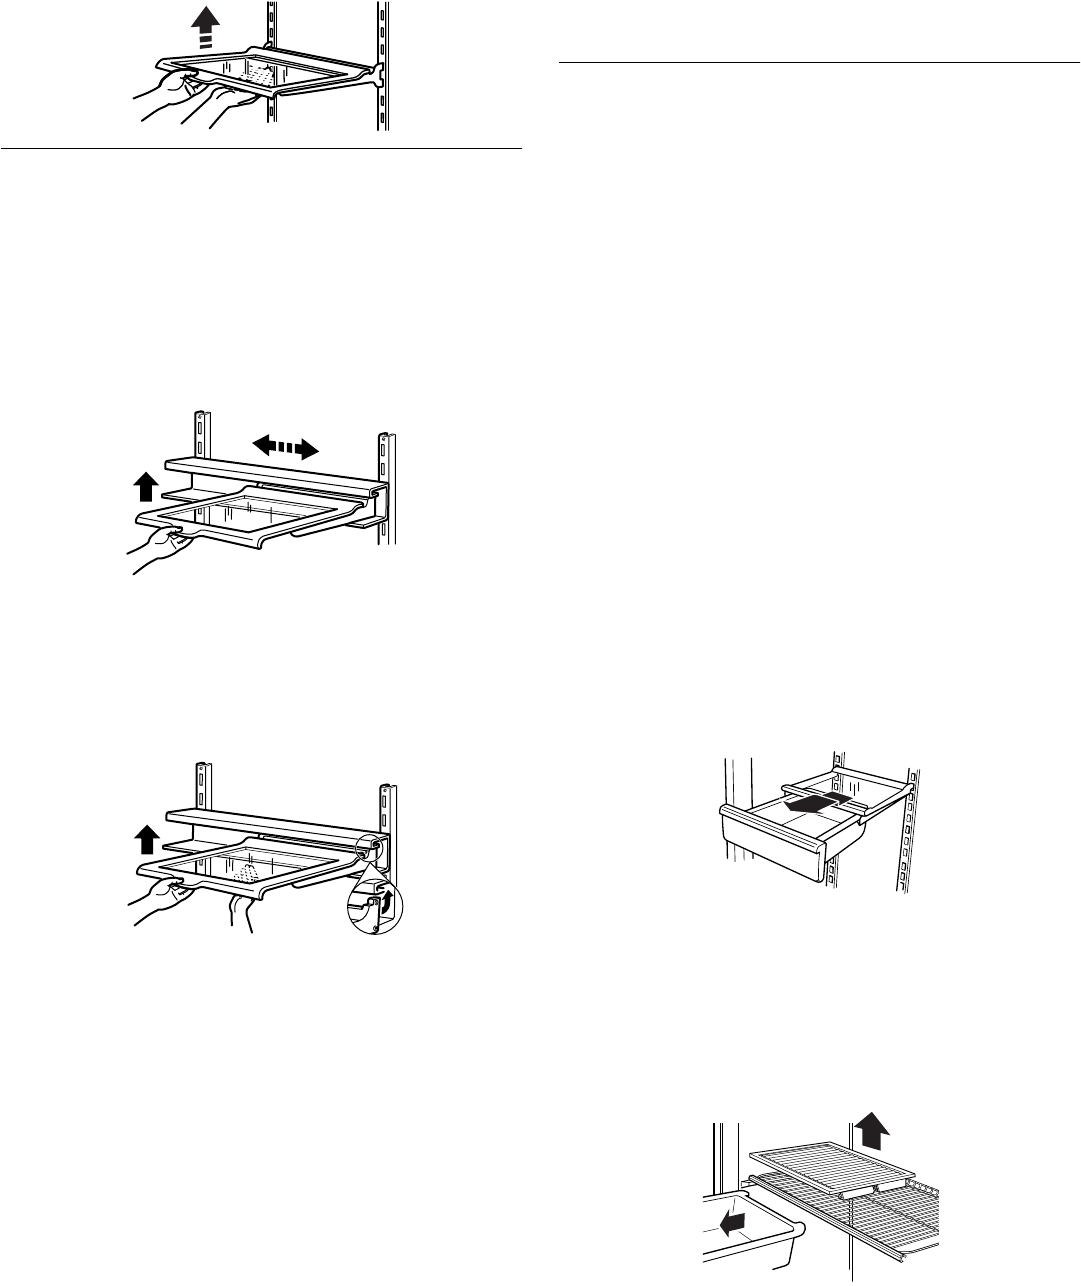 Kit de Fixation Et Couvercle Angle 40 I-Type Rainure 8 Incl